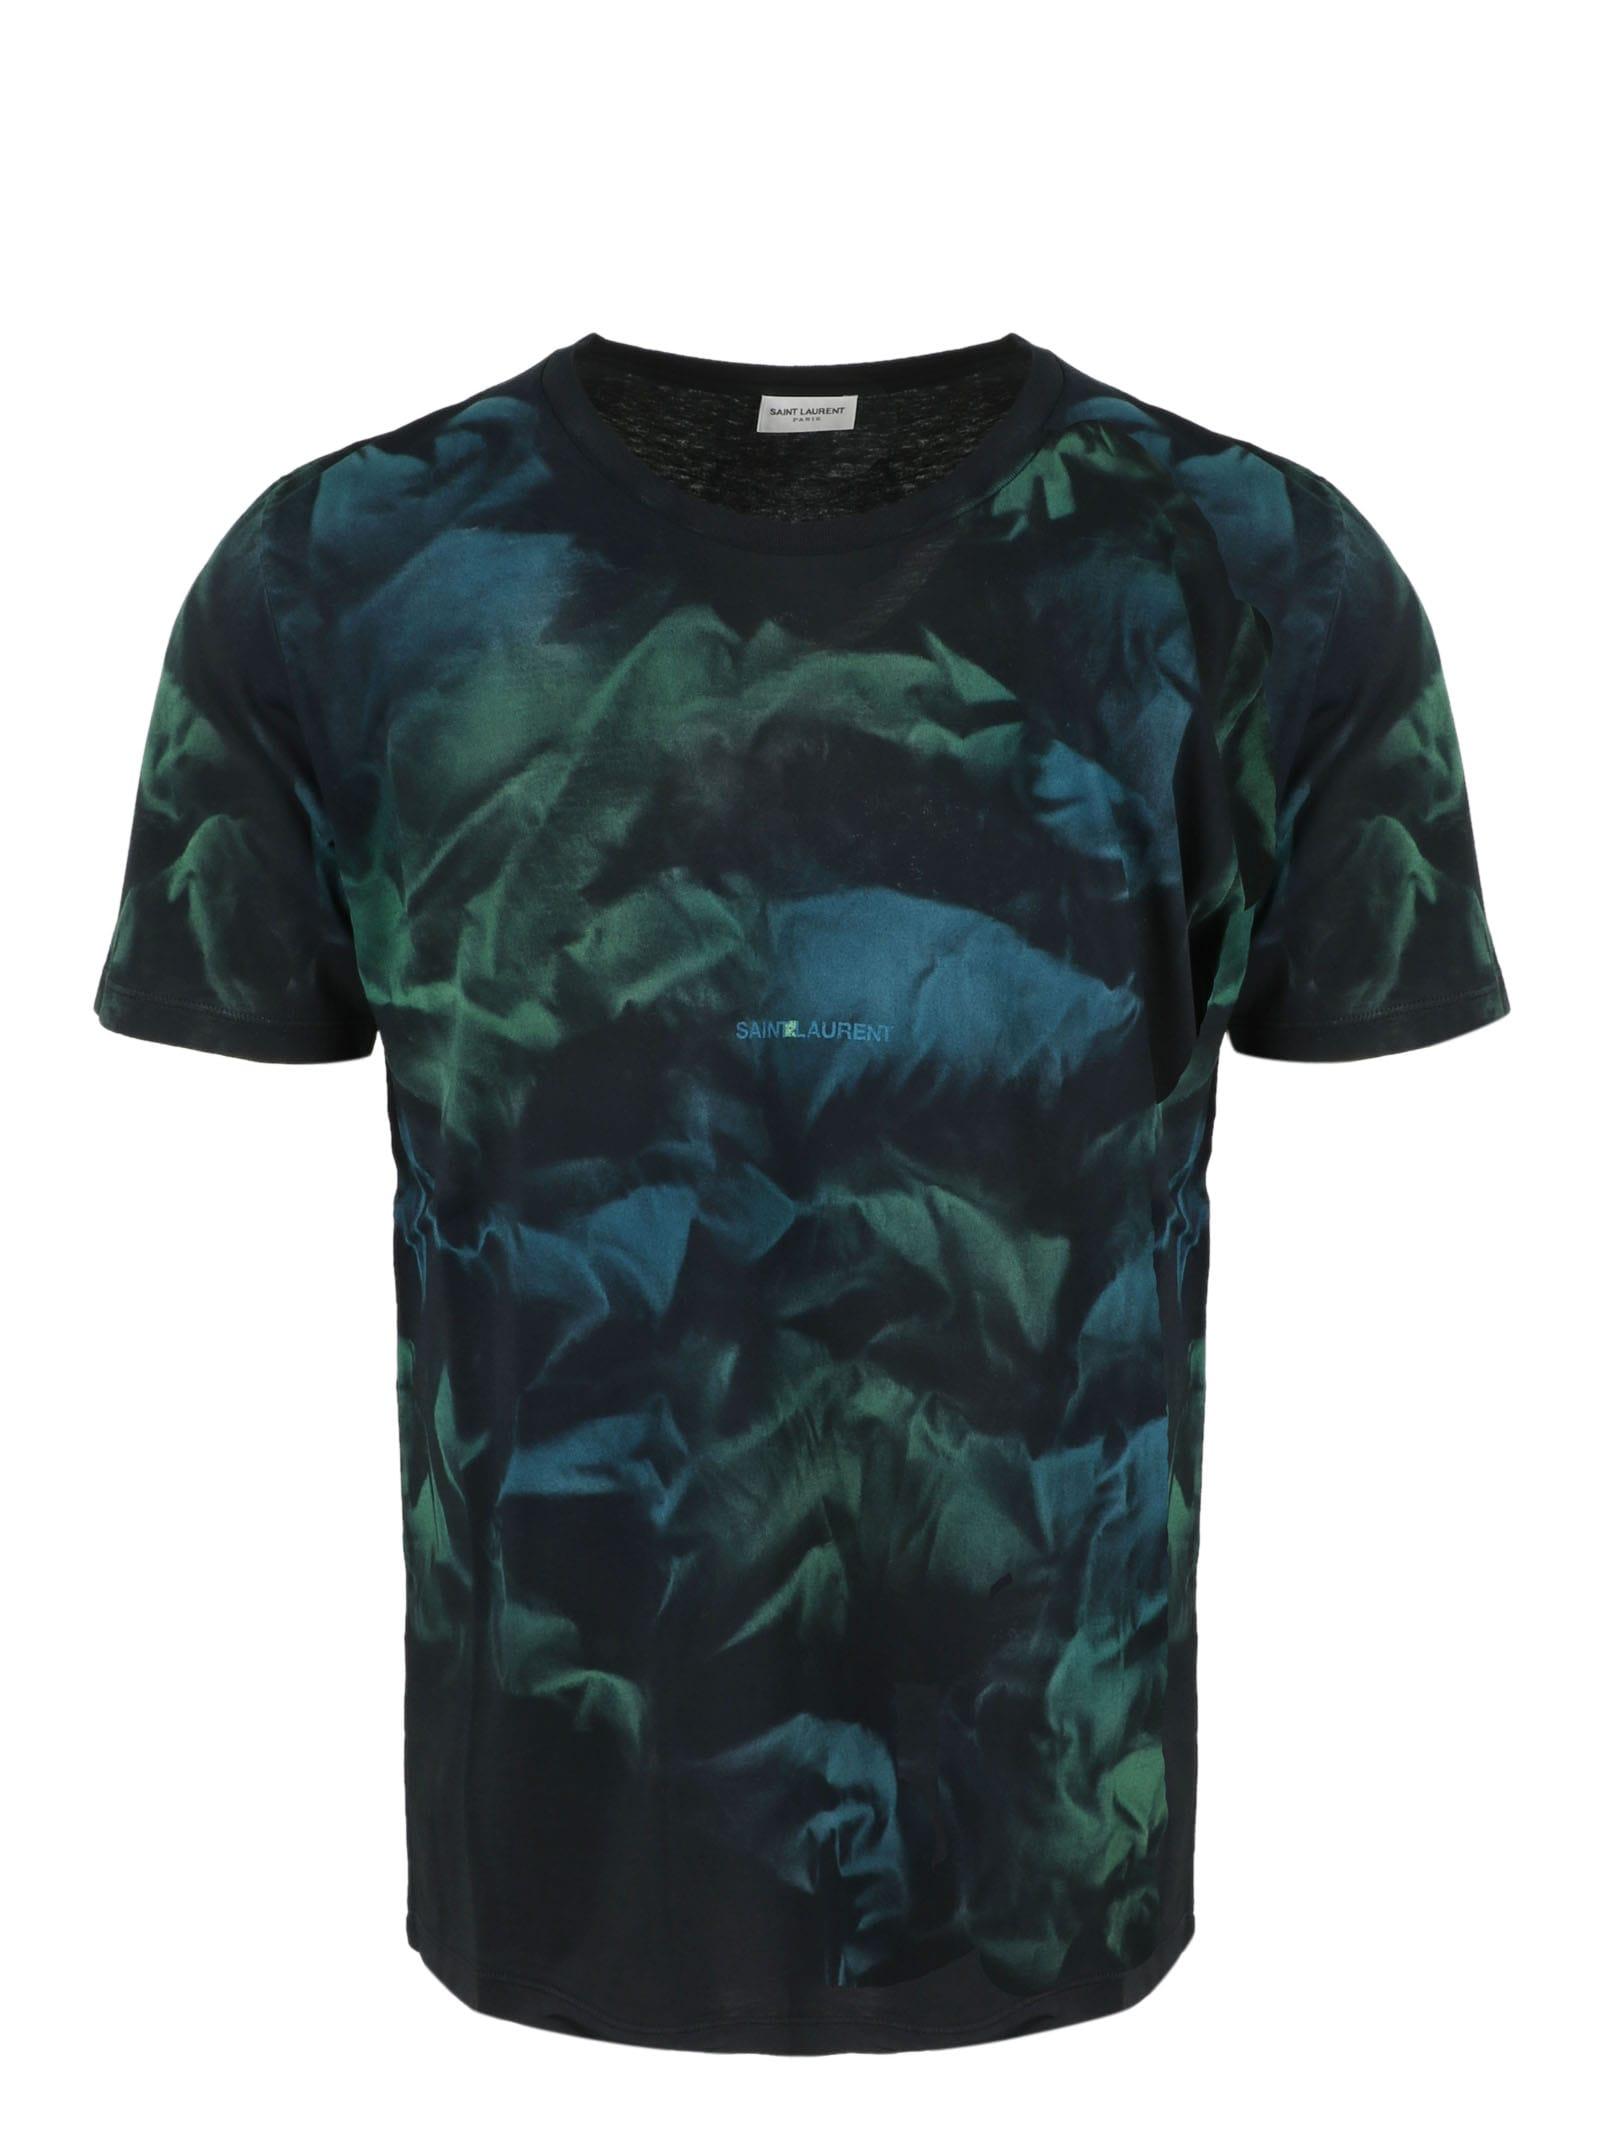 Saint Laurent Tye-dye T-shirt